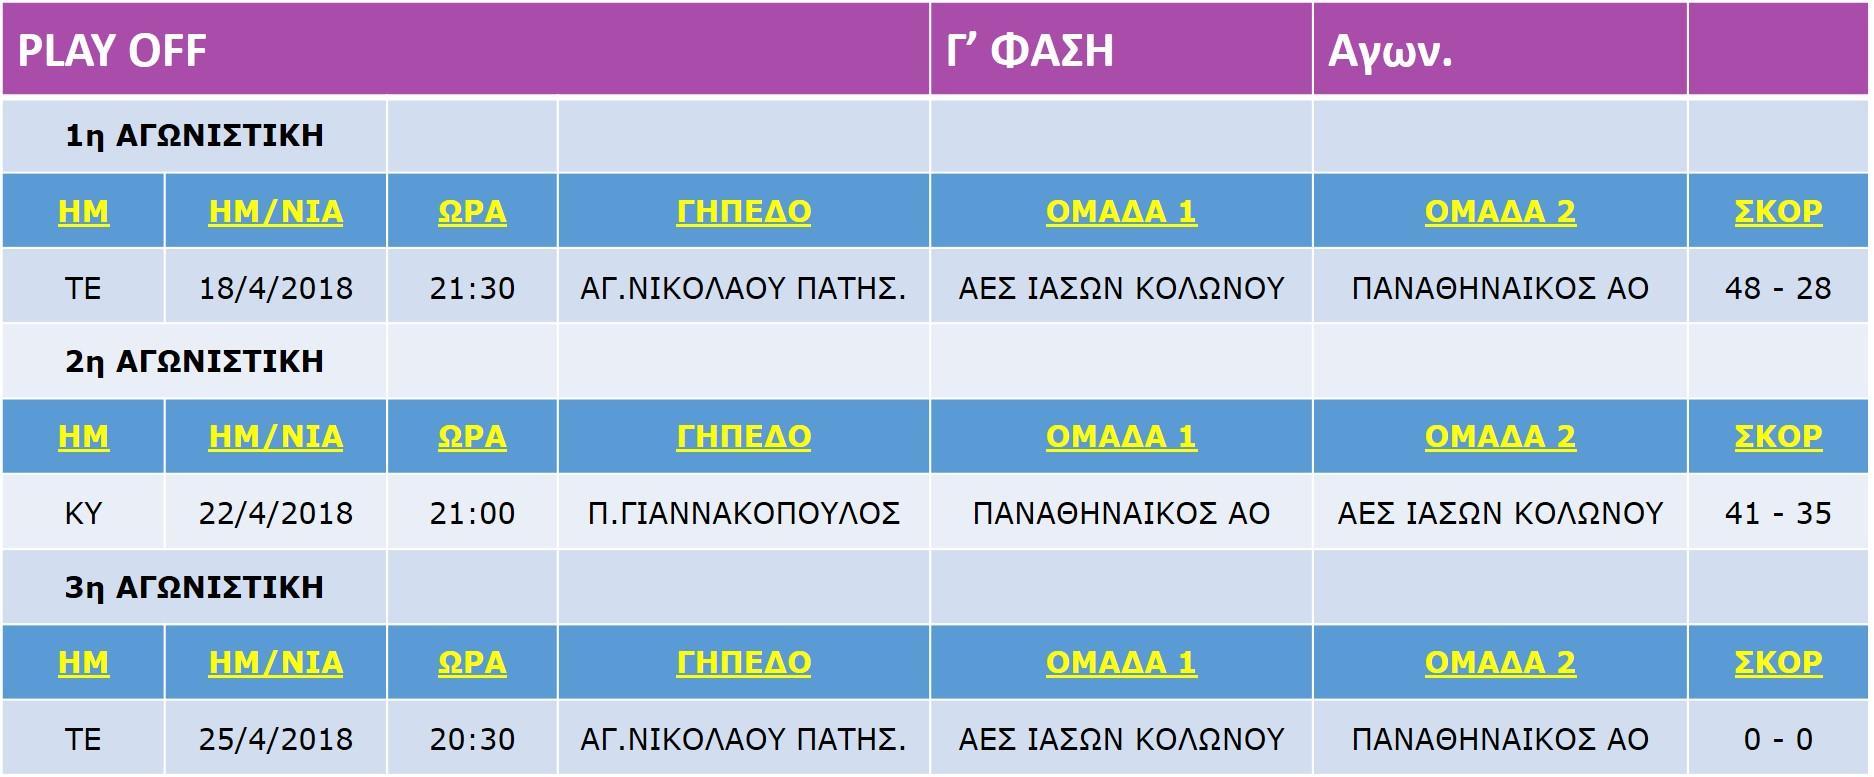 Korasides_Play-Off-C2